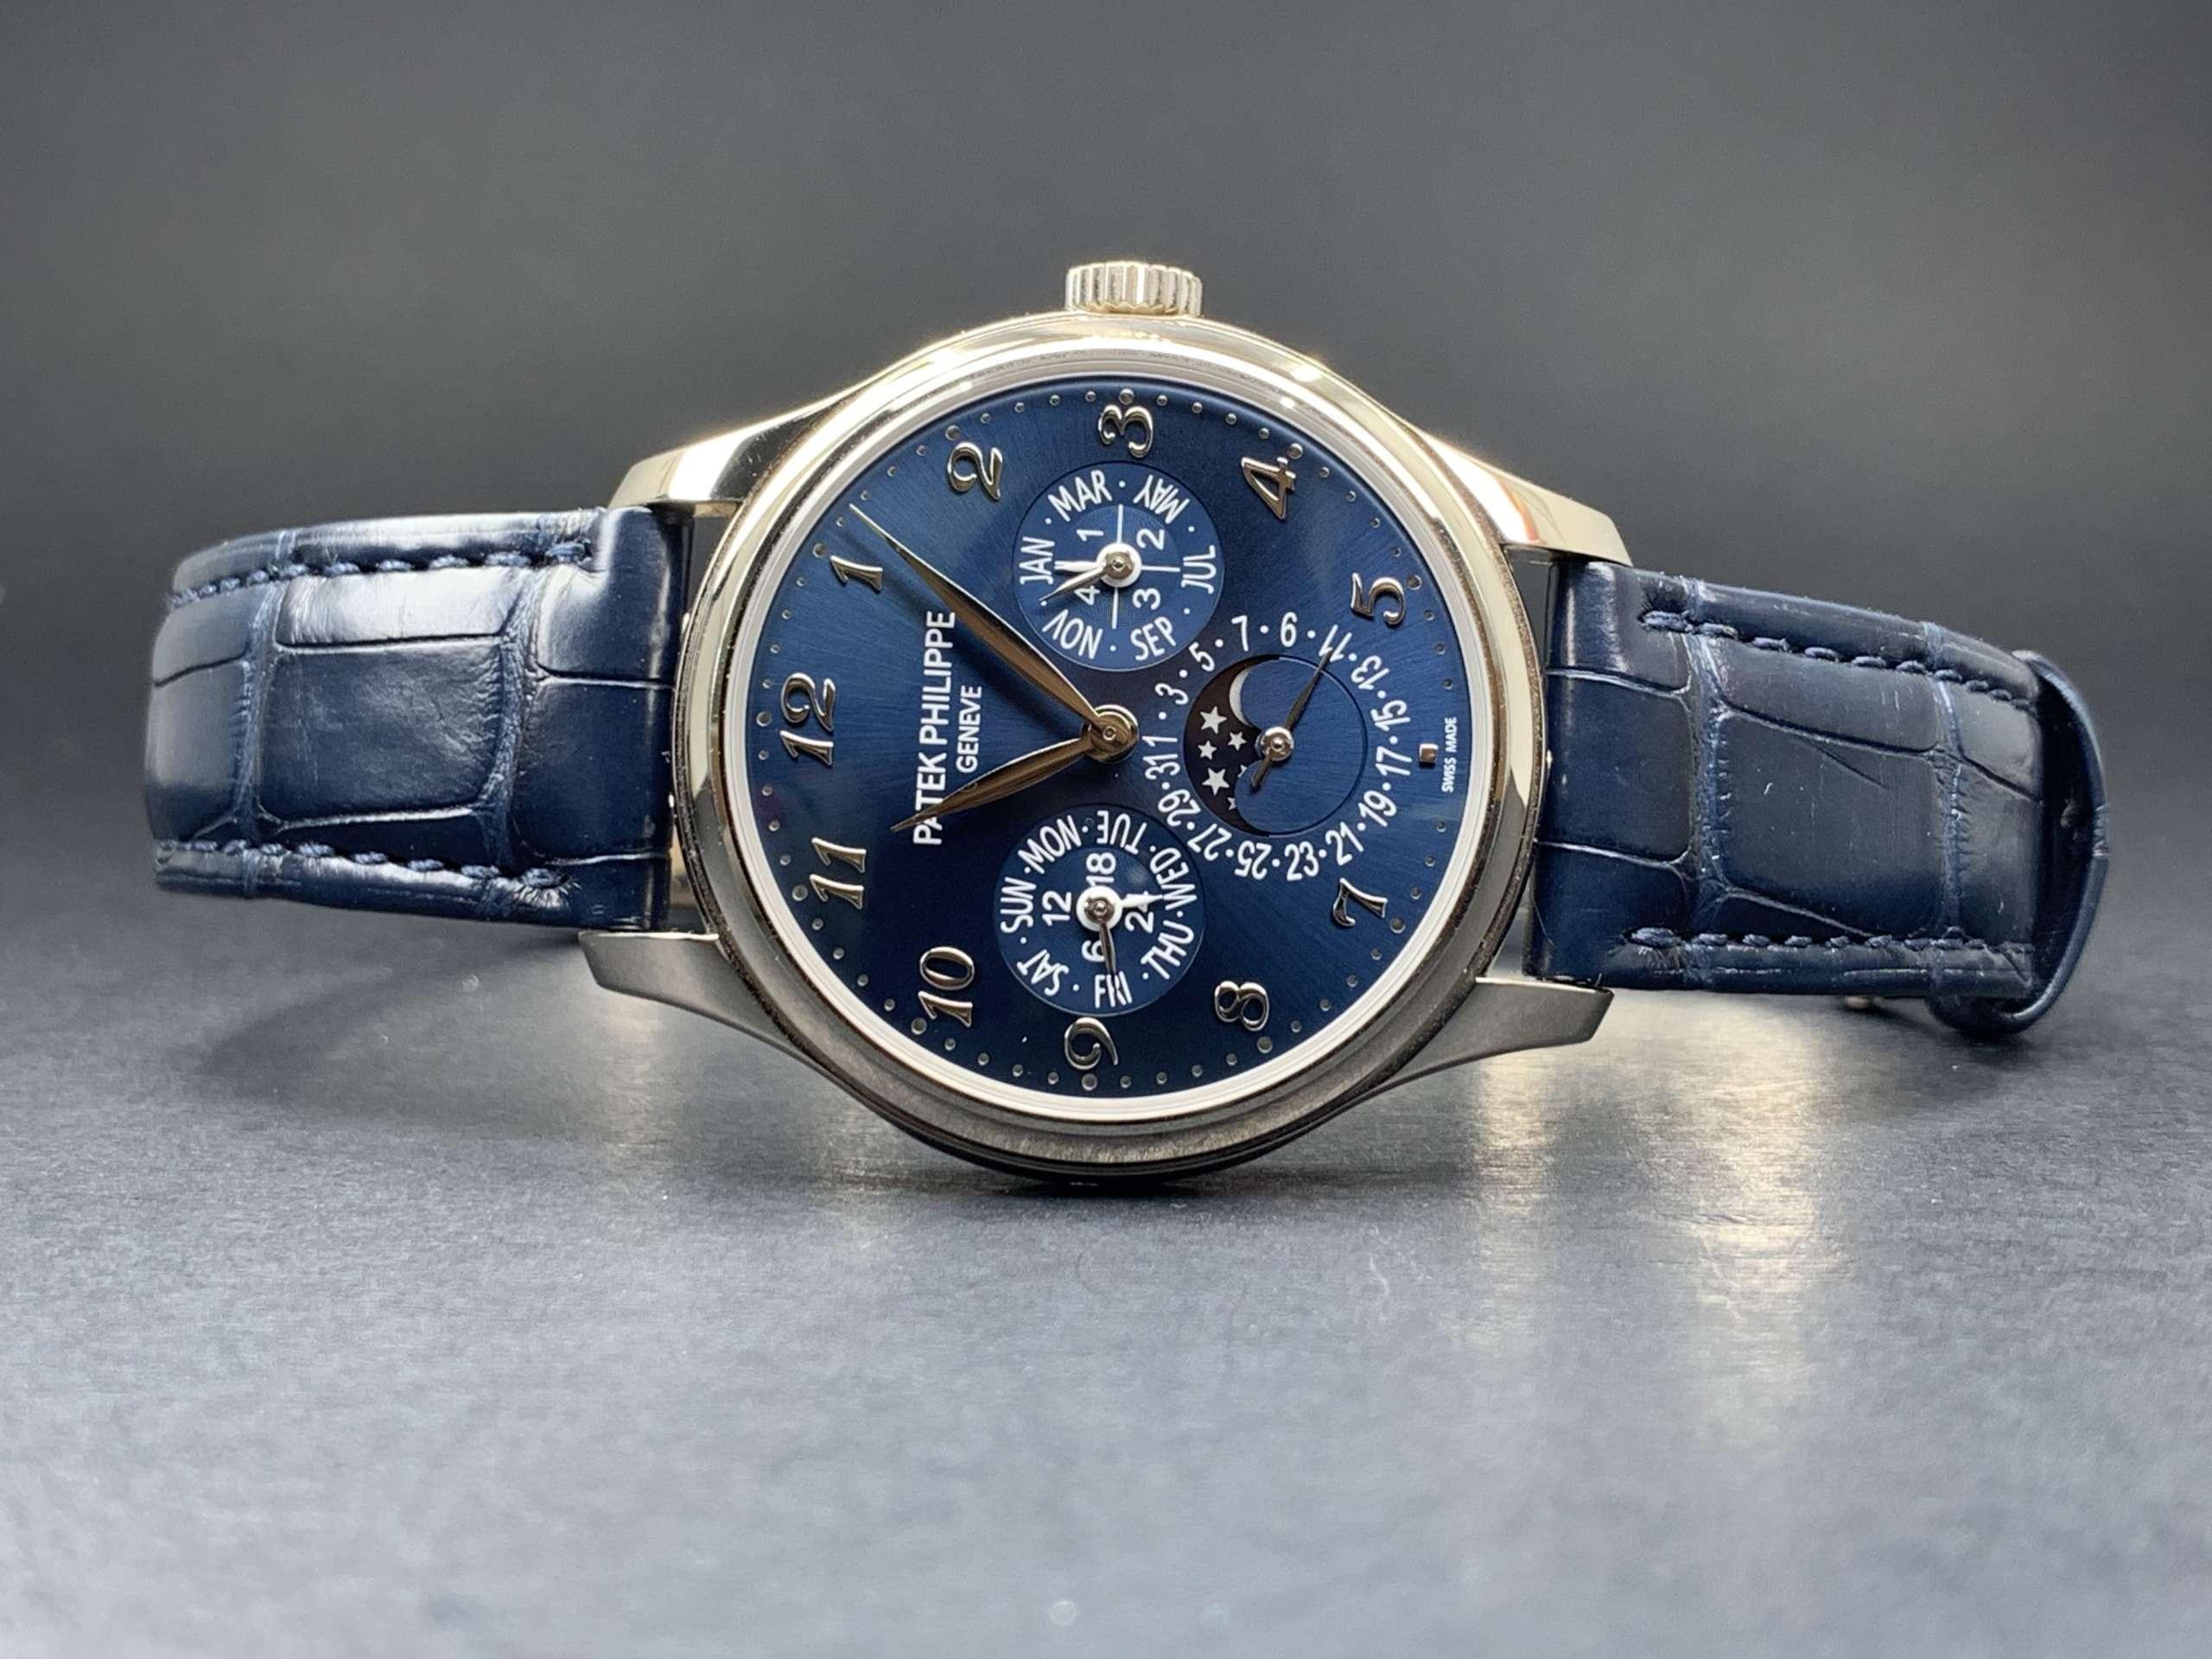 Patek Philippe Grand Complications Perpetual Calendar Ultra Thin - 5327G |  Luxury brand watches for sale, Monaco, Zurich, Dubai, Hong Kong